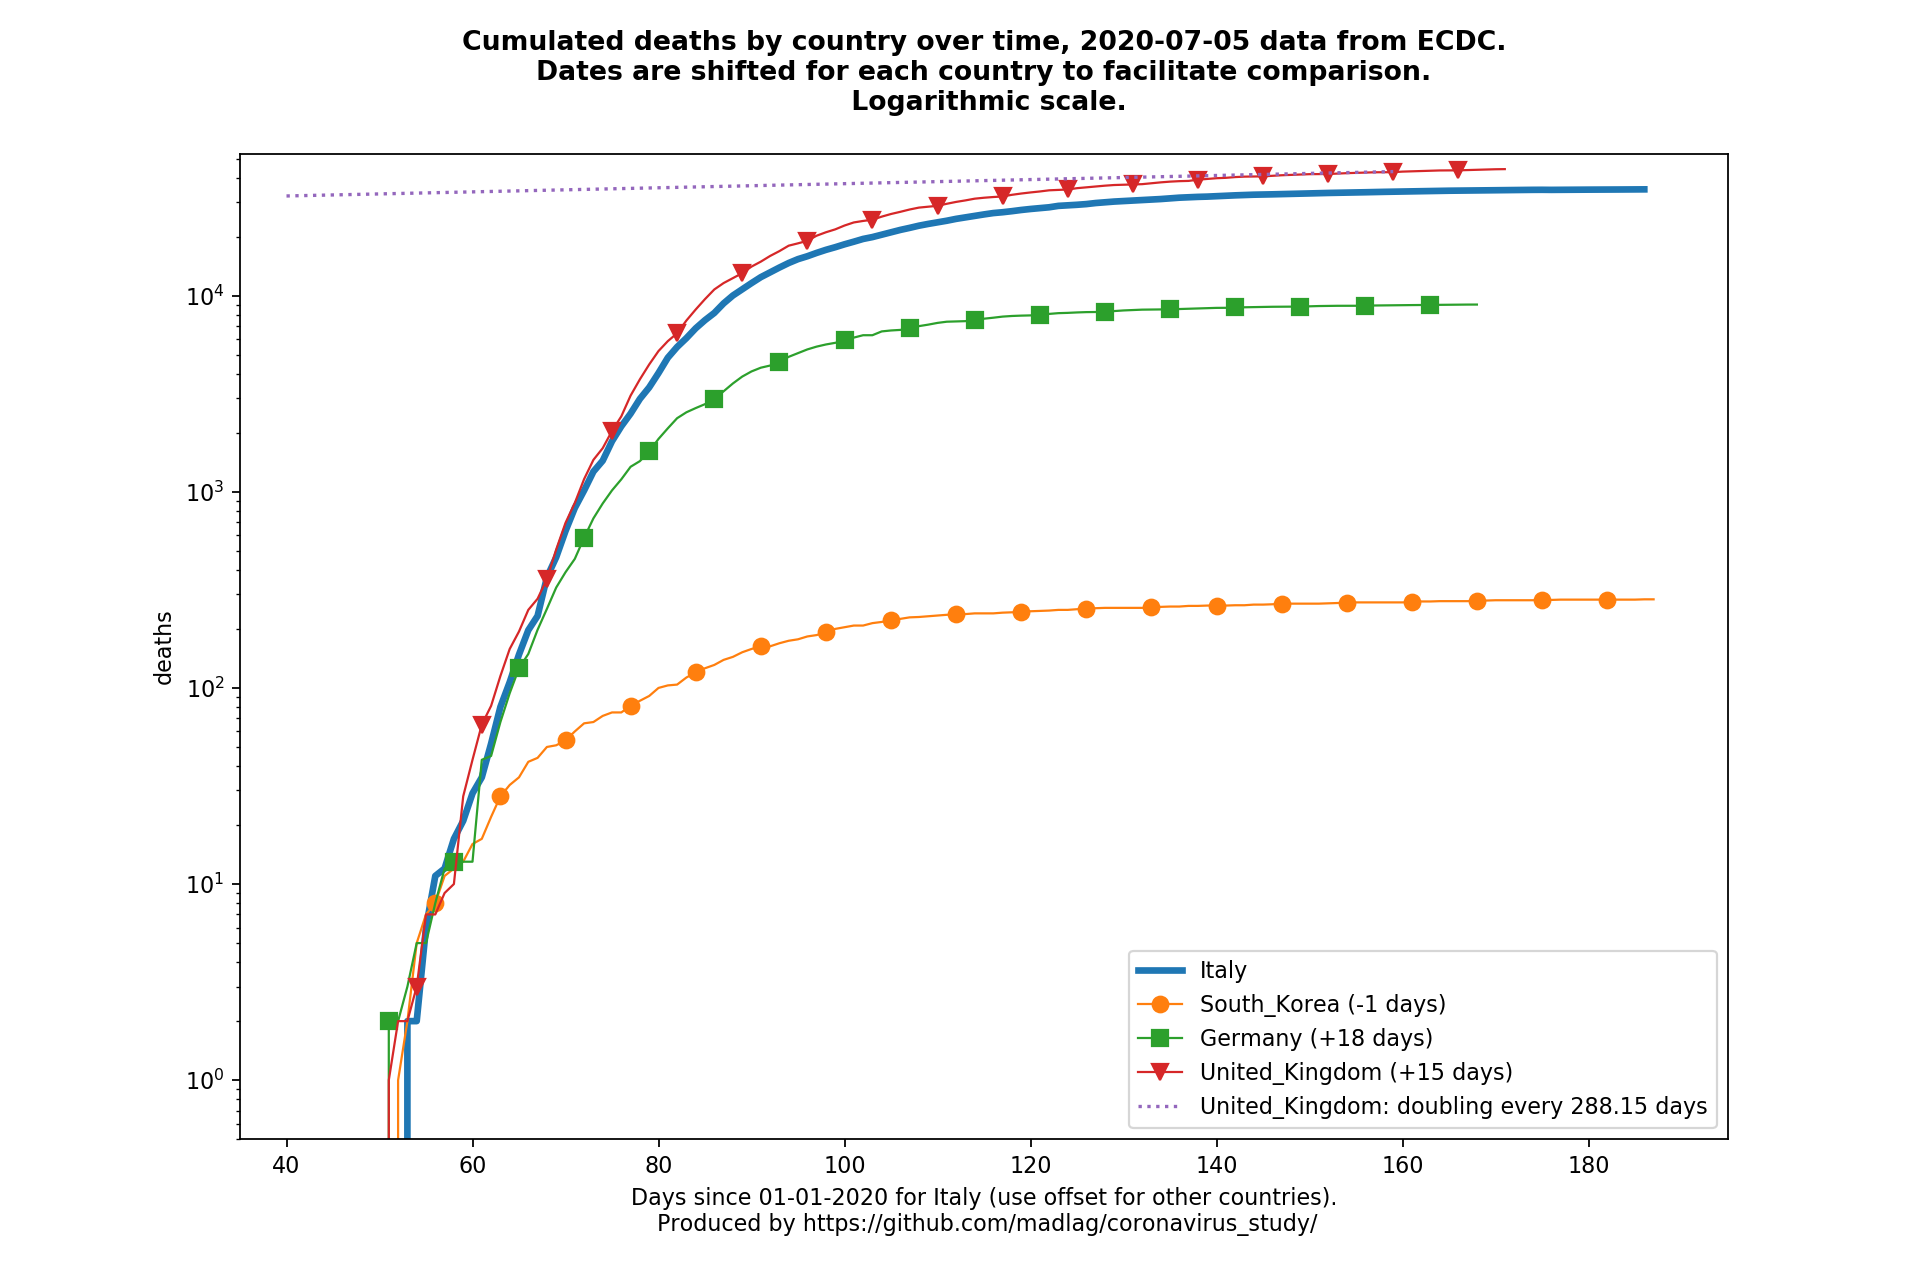 United Kingdom covid-19 cumulated deaths static chart